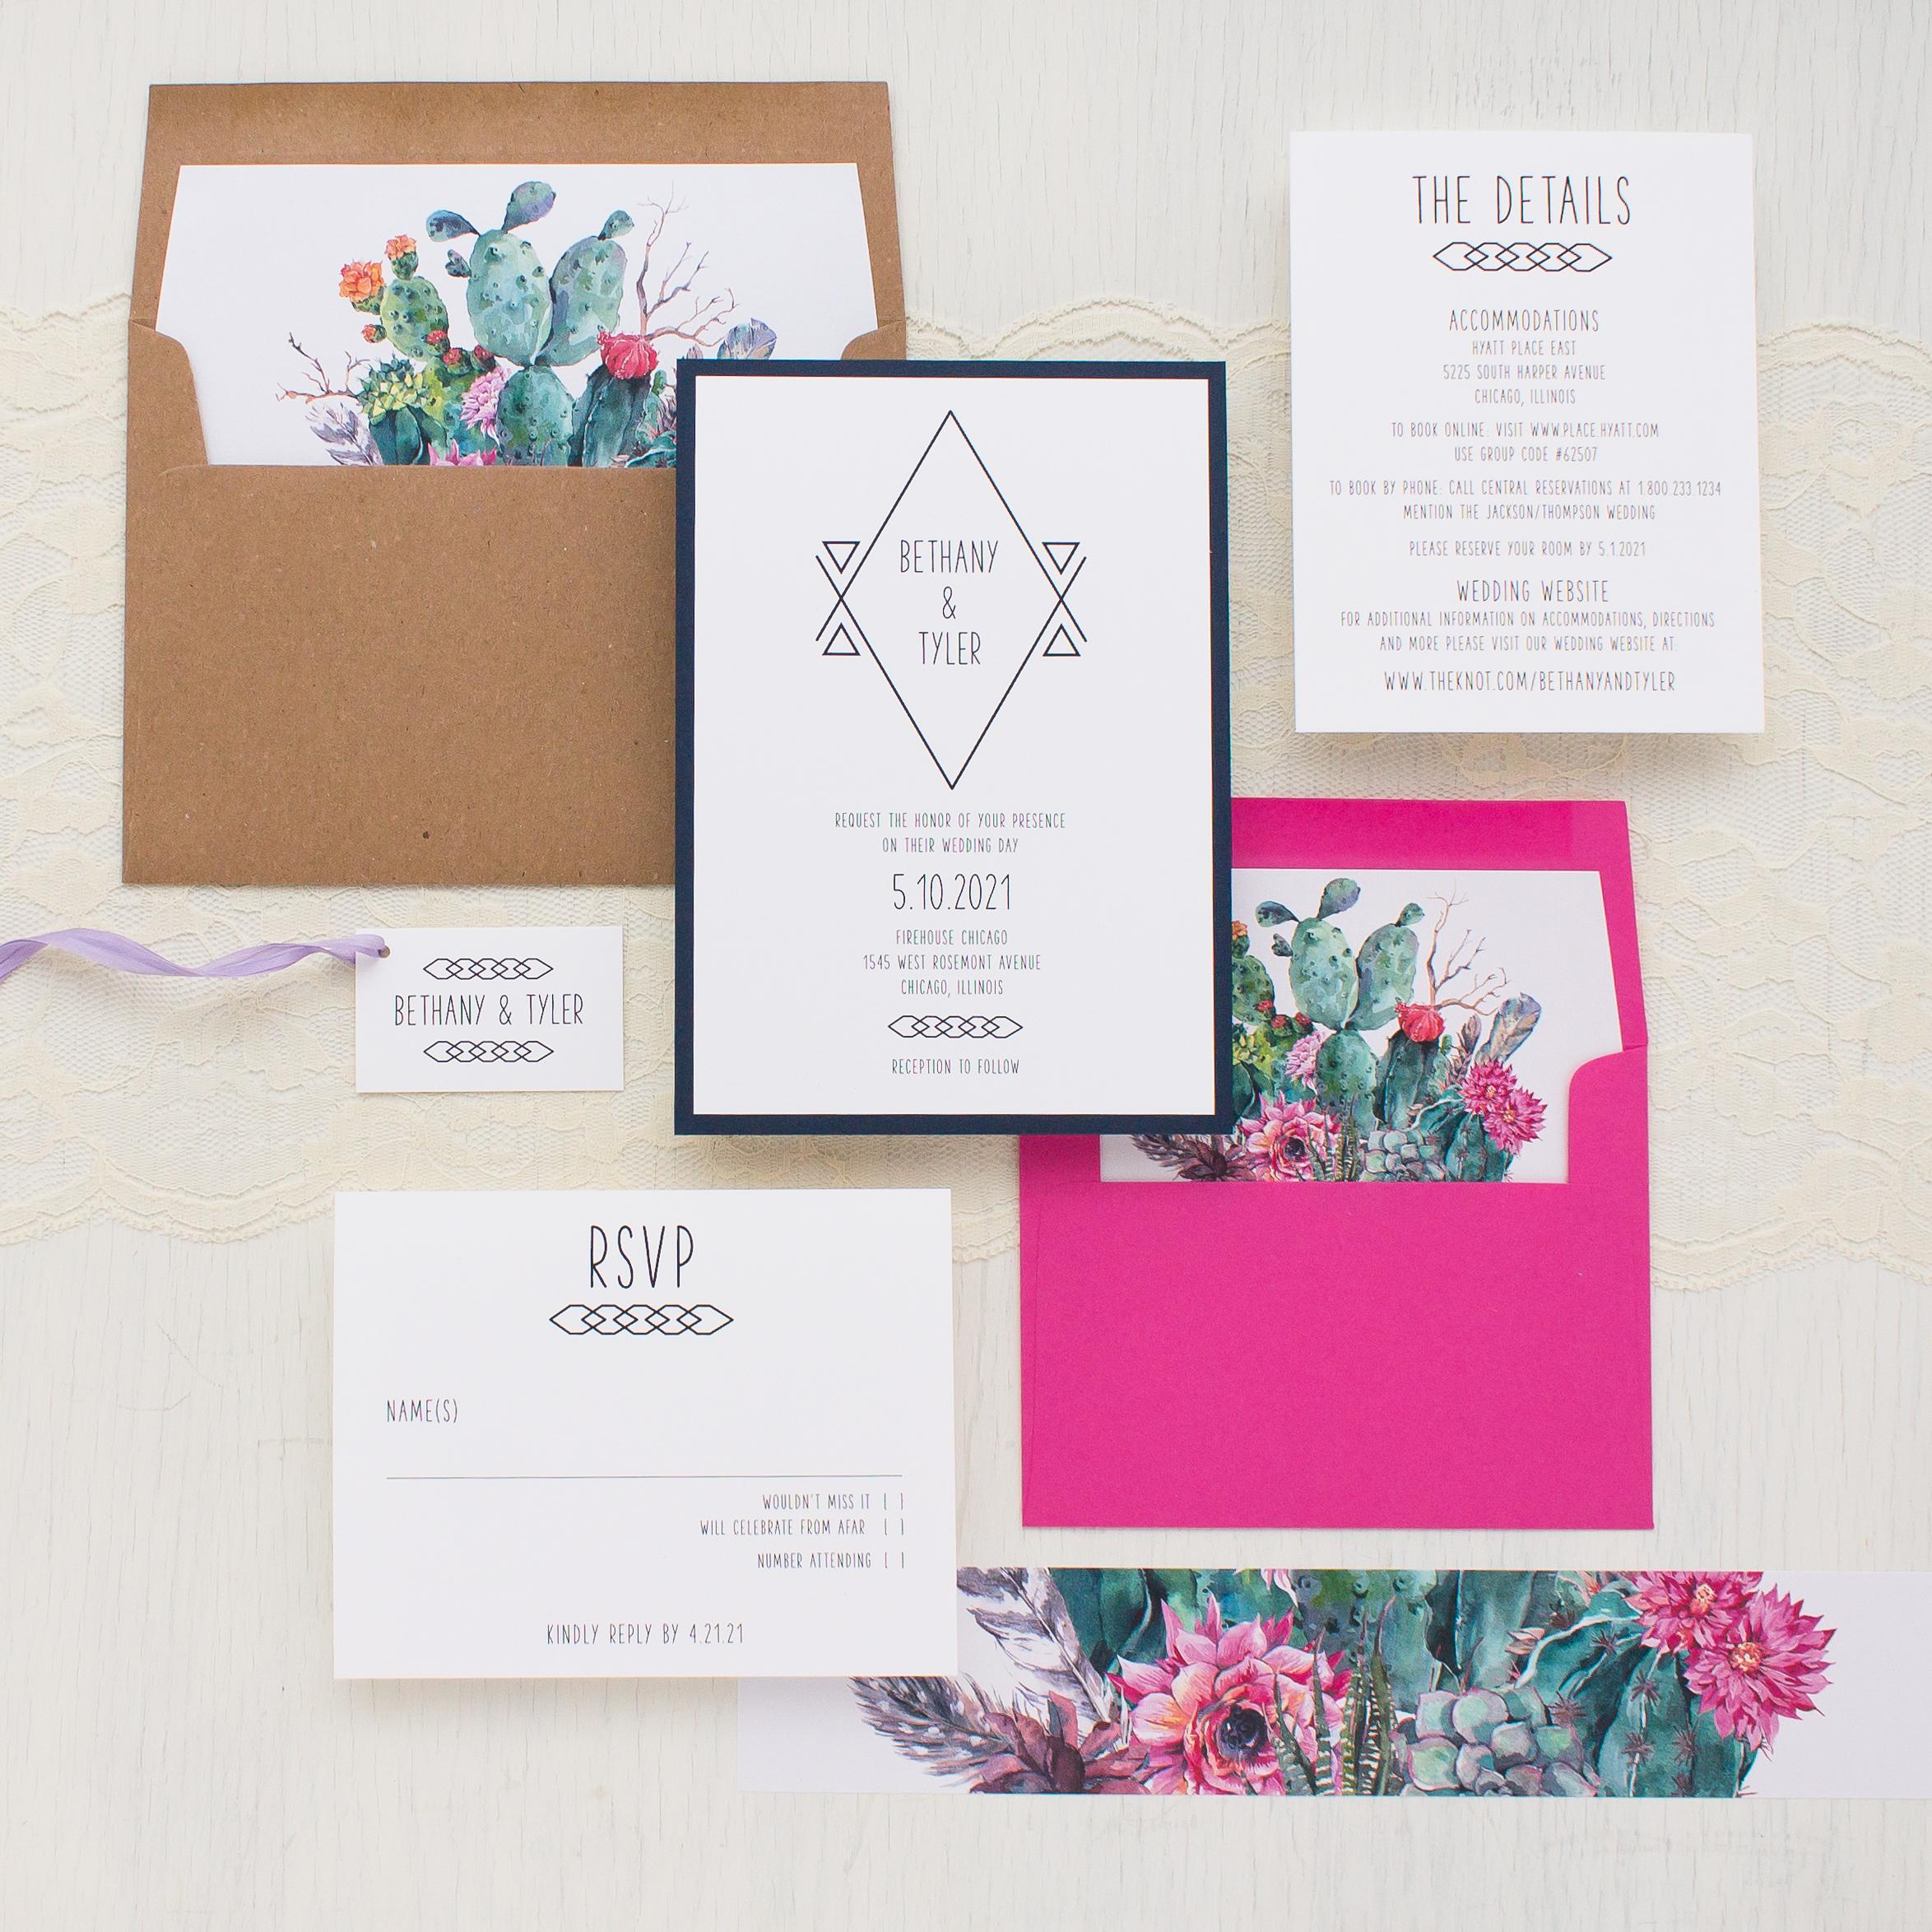 Desert Blooms #2 Wedding Invitations | Beacon Lane